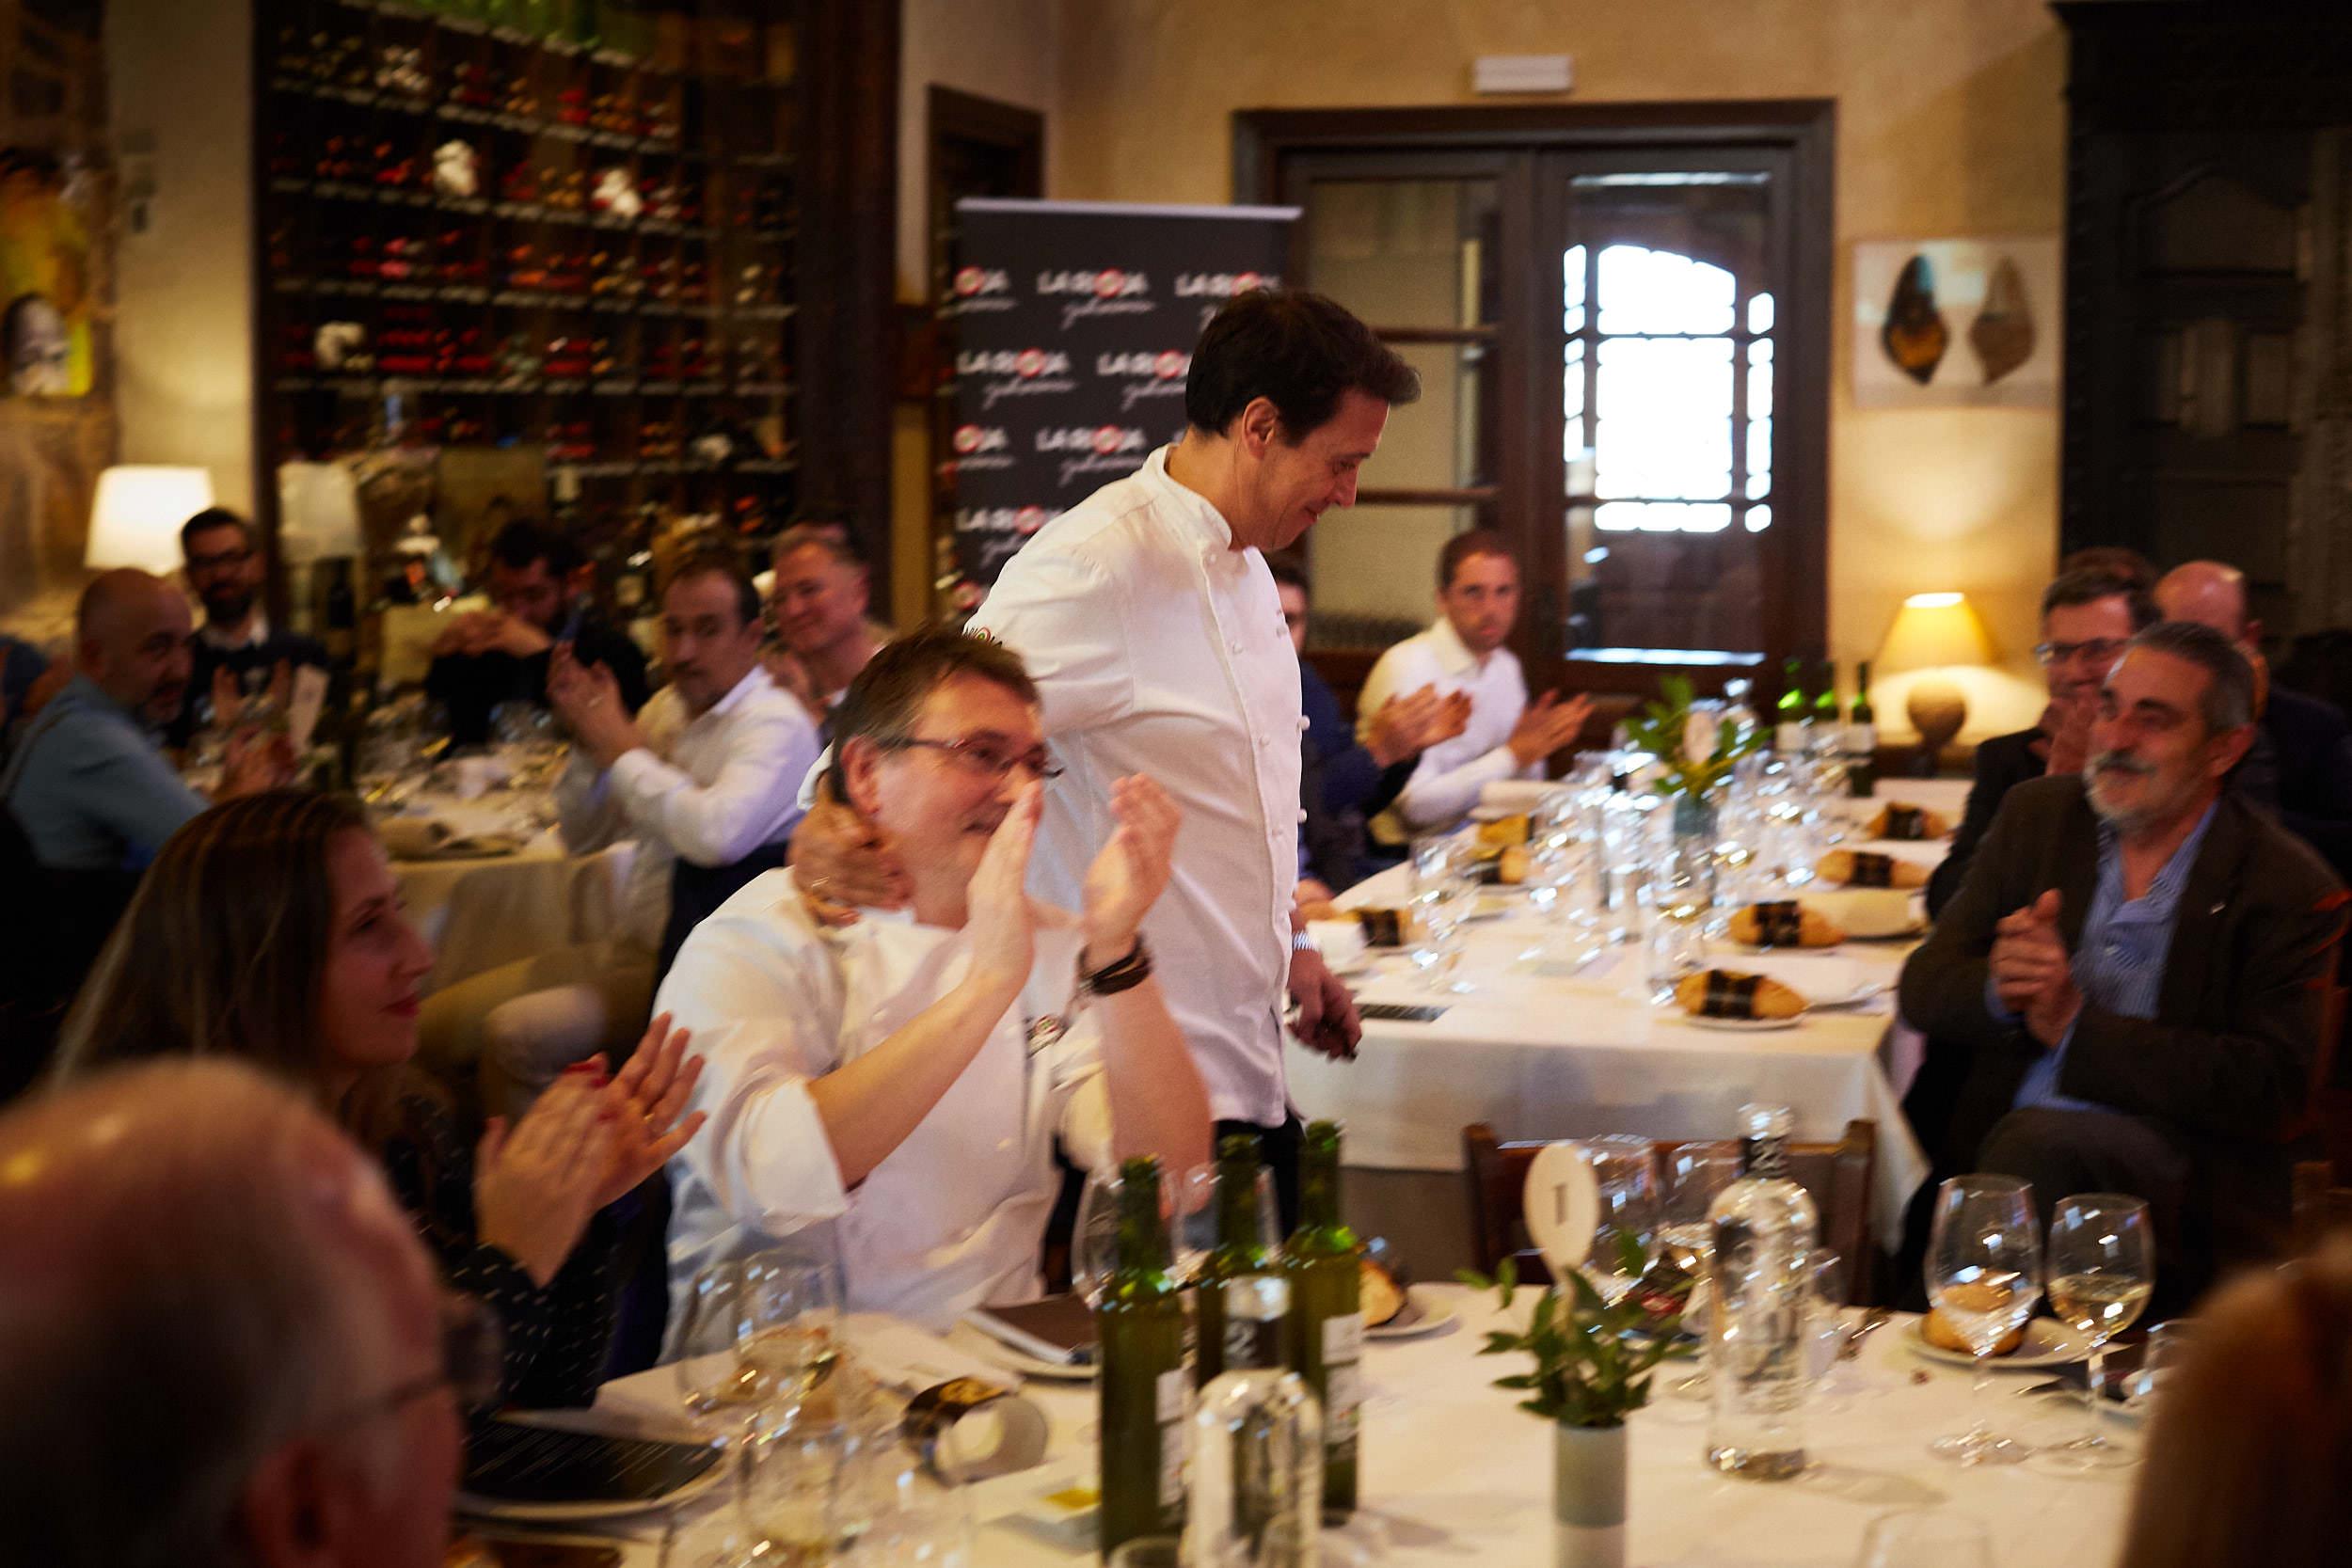 1/3/19 Rioja Capital, Restaurante La Vieja Bodega, Casalarreina (La Rioja), Spain. Photo by James Sturcke | sturcke.org